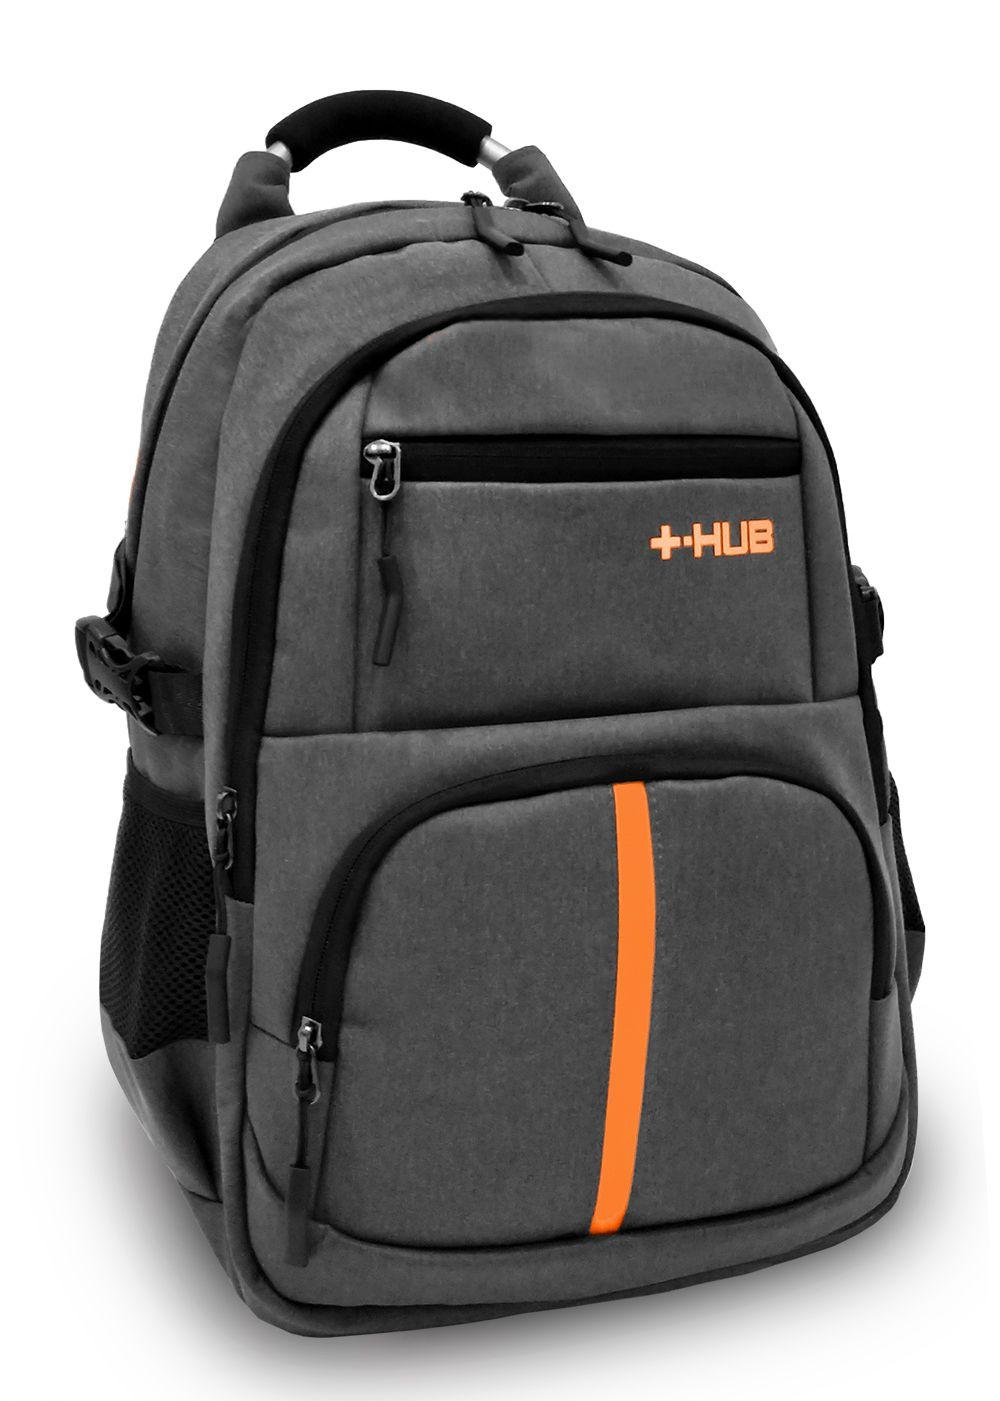 Mochila Executiva Notebook Hub M137 Premium 30L Cinza